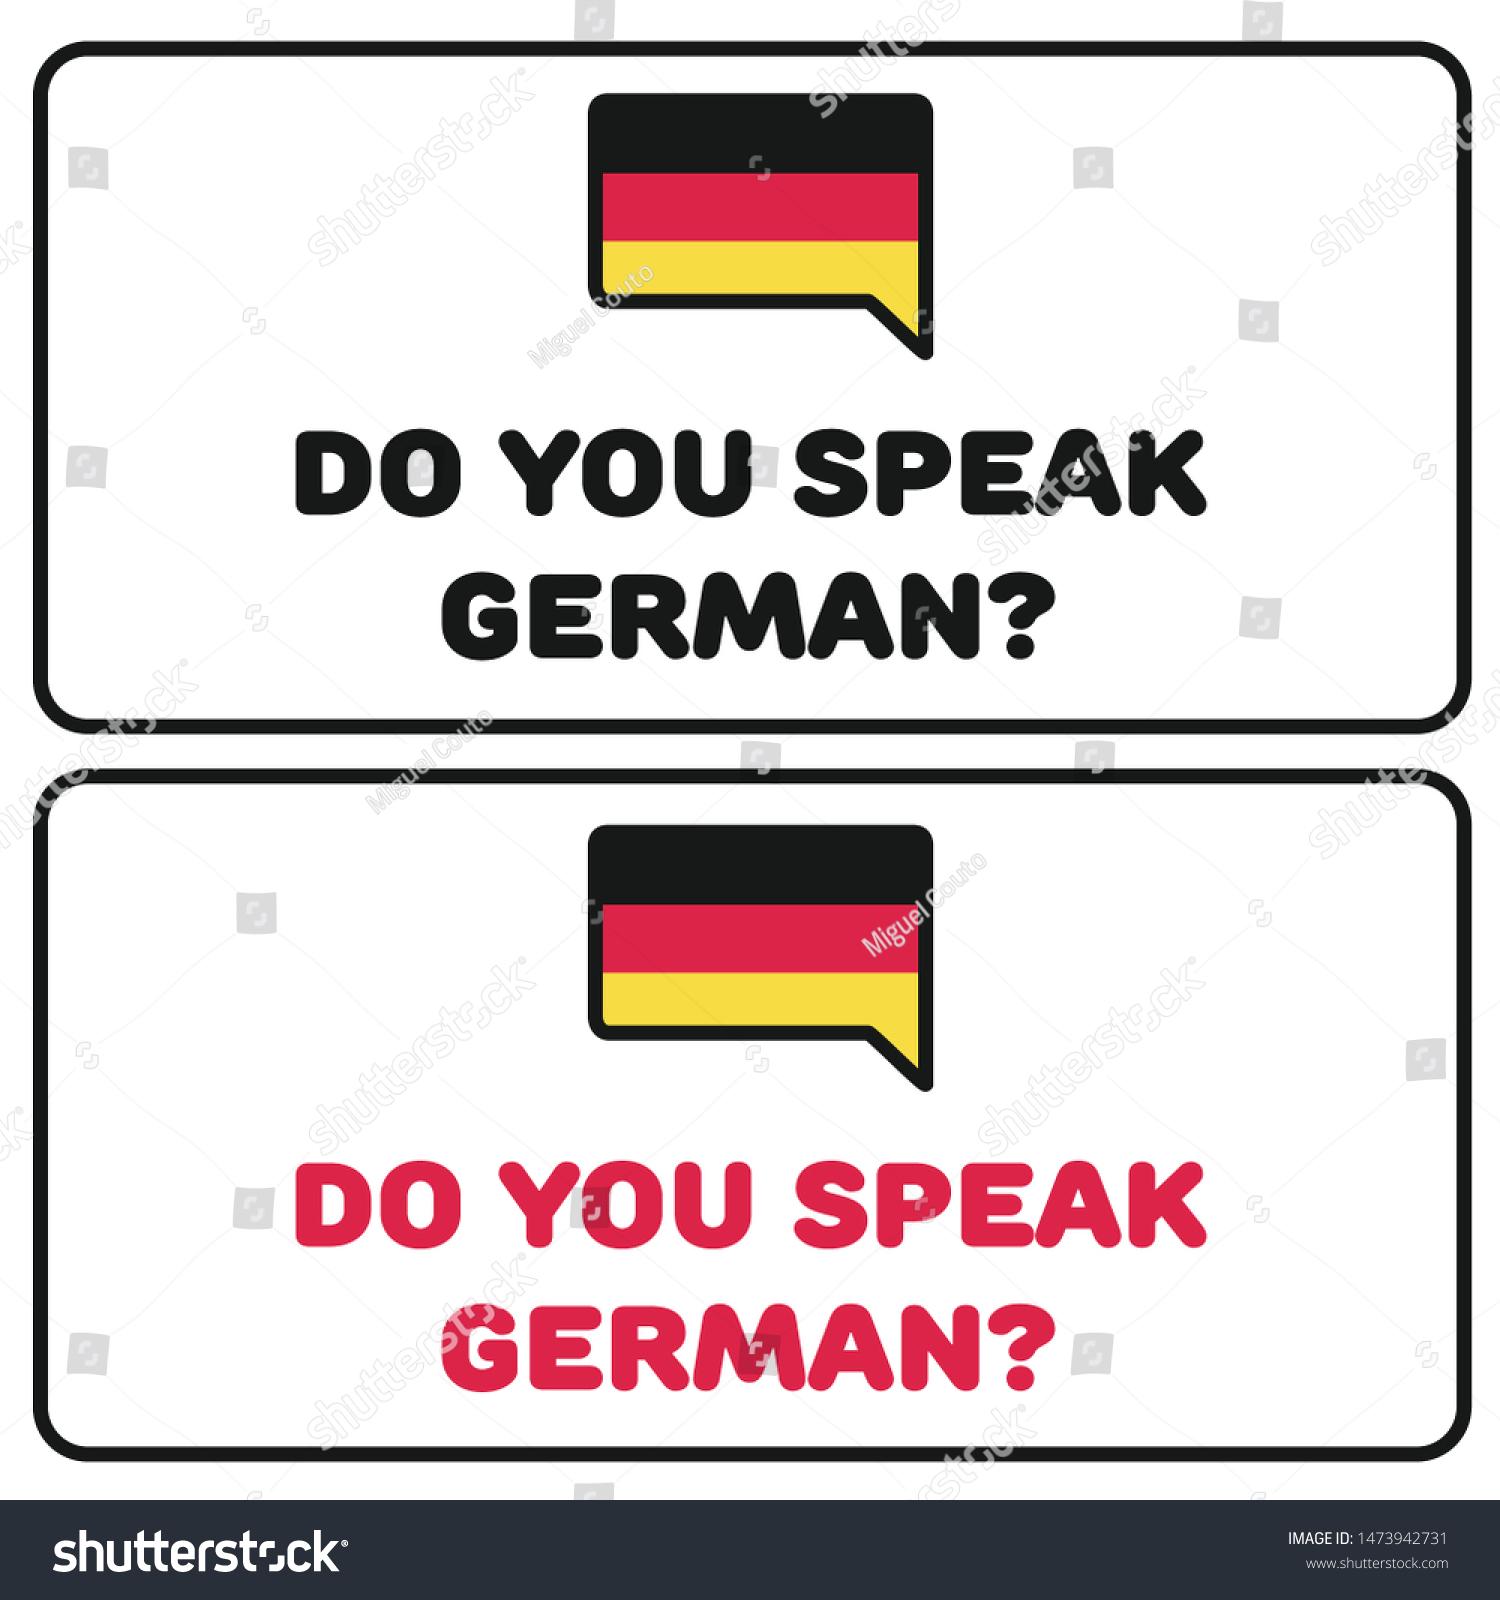 Do You Speak English Language Idioms Stock Vector Royalty Free 1473942731